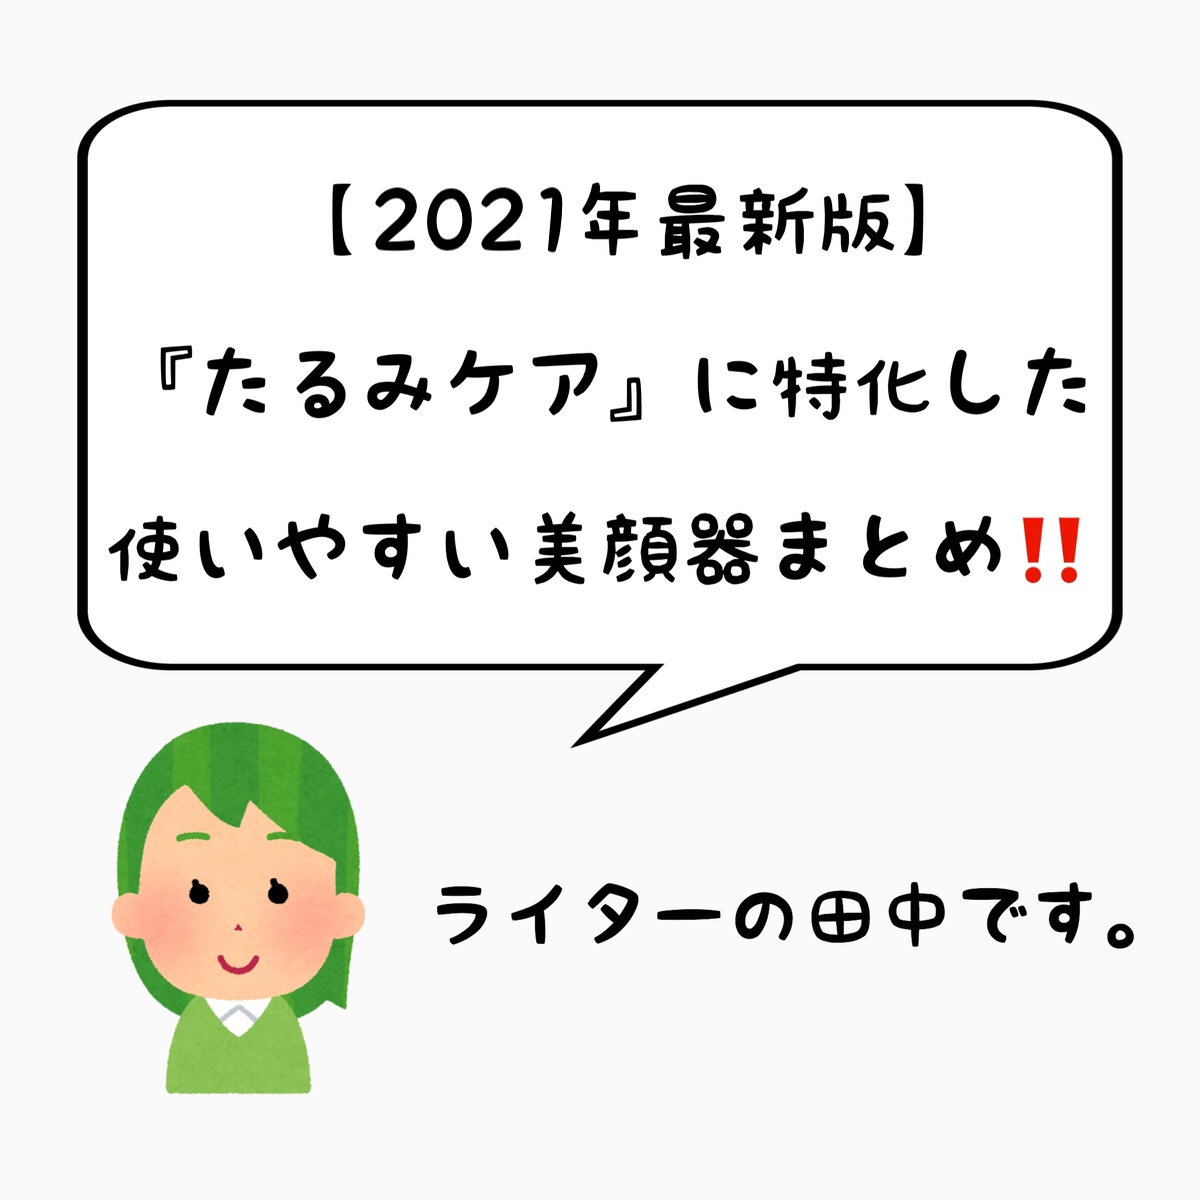 f:id:nokonoko_o:20210111005900j:plain